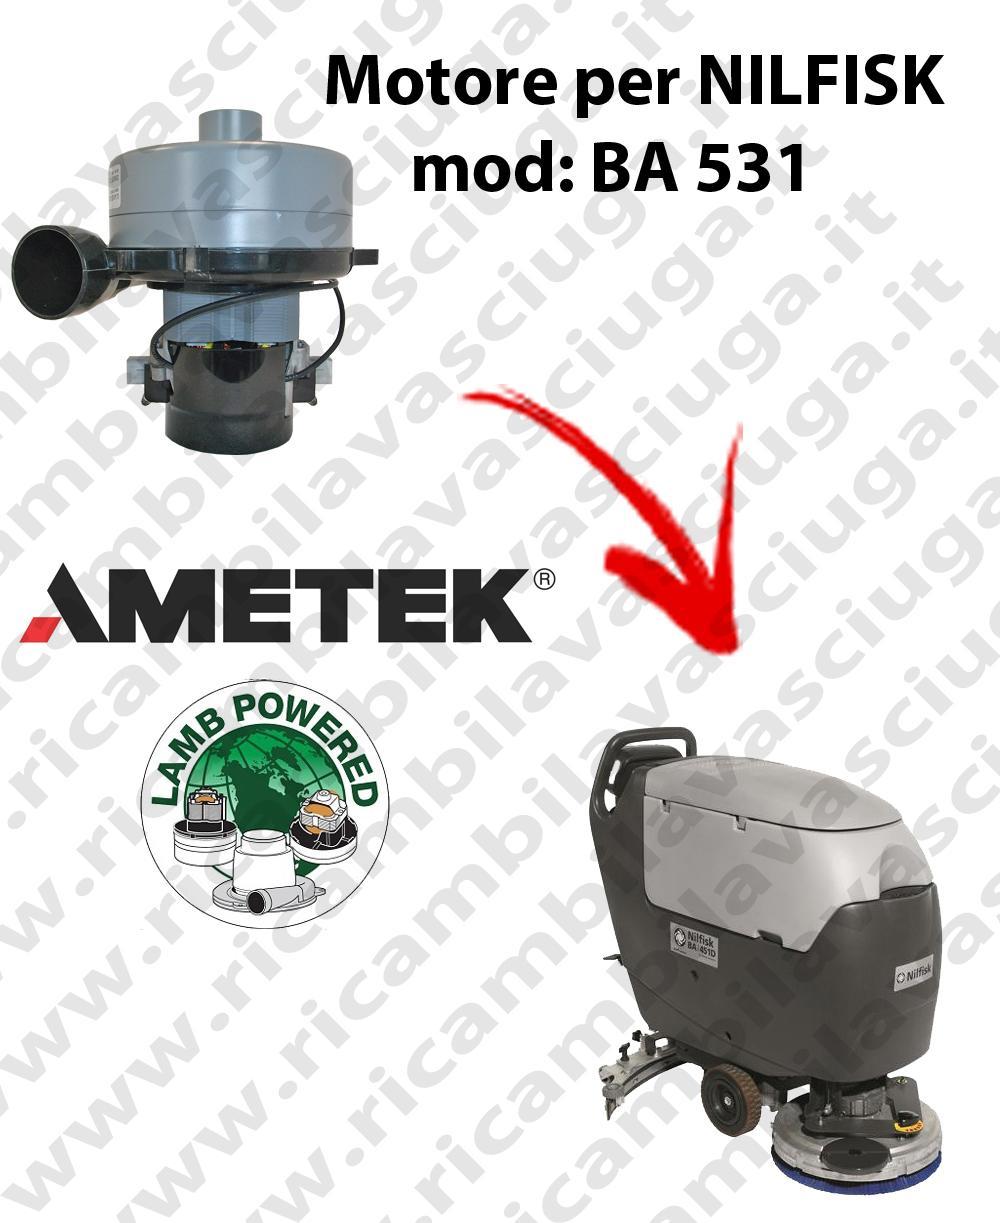 BA 531 MOTORE aspirazione LAMB AMETEK per lavapavimenti NILFISK